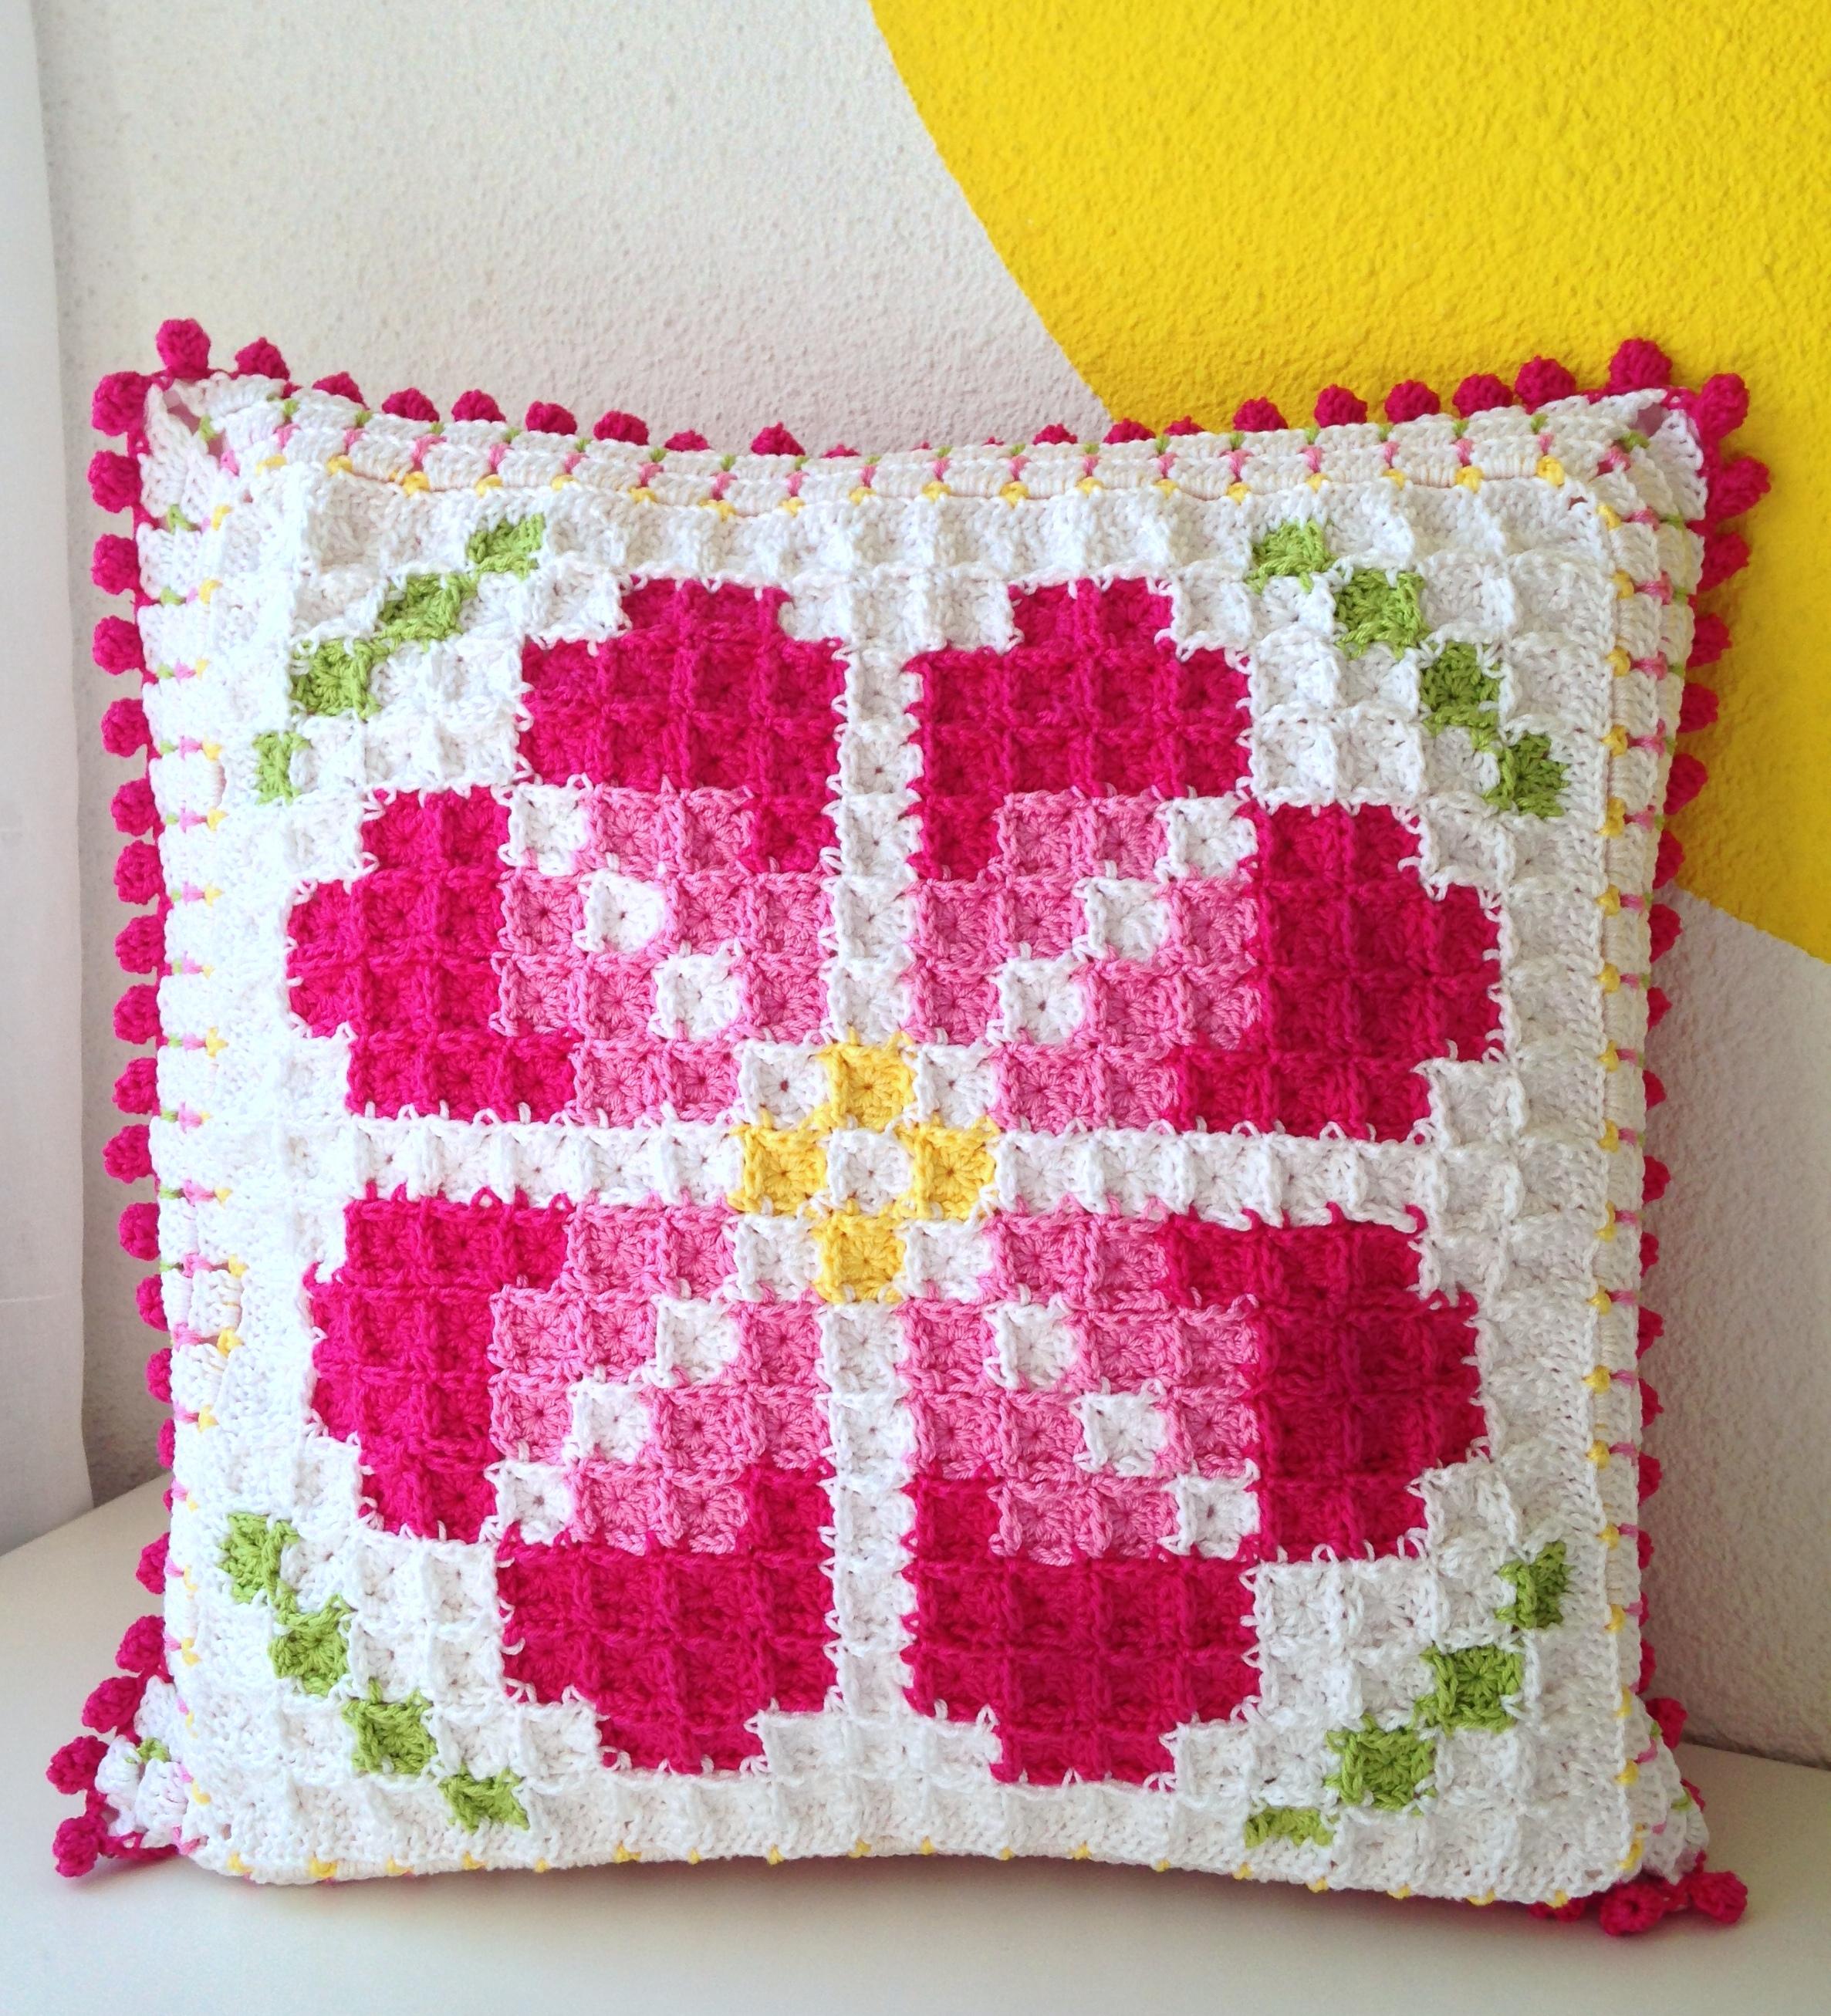 MaRRose – Colorful Crochet & Crafts